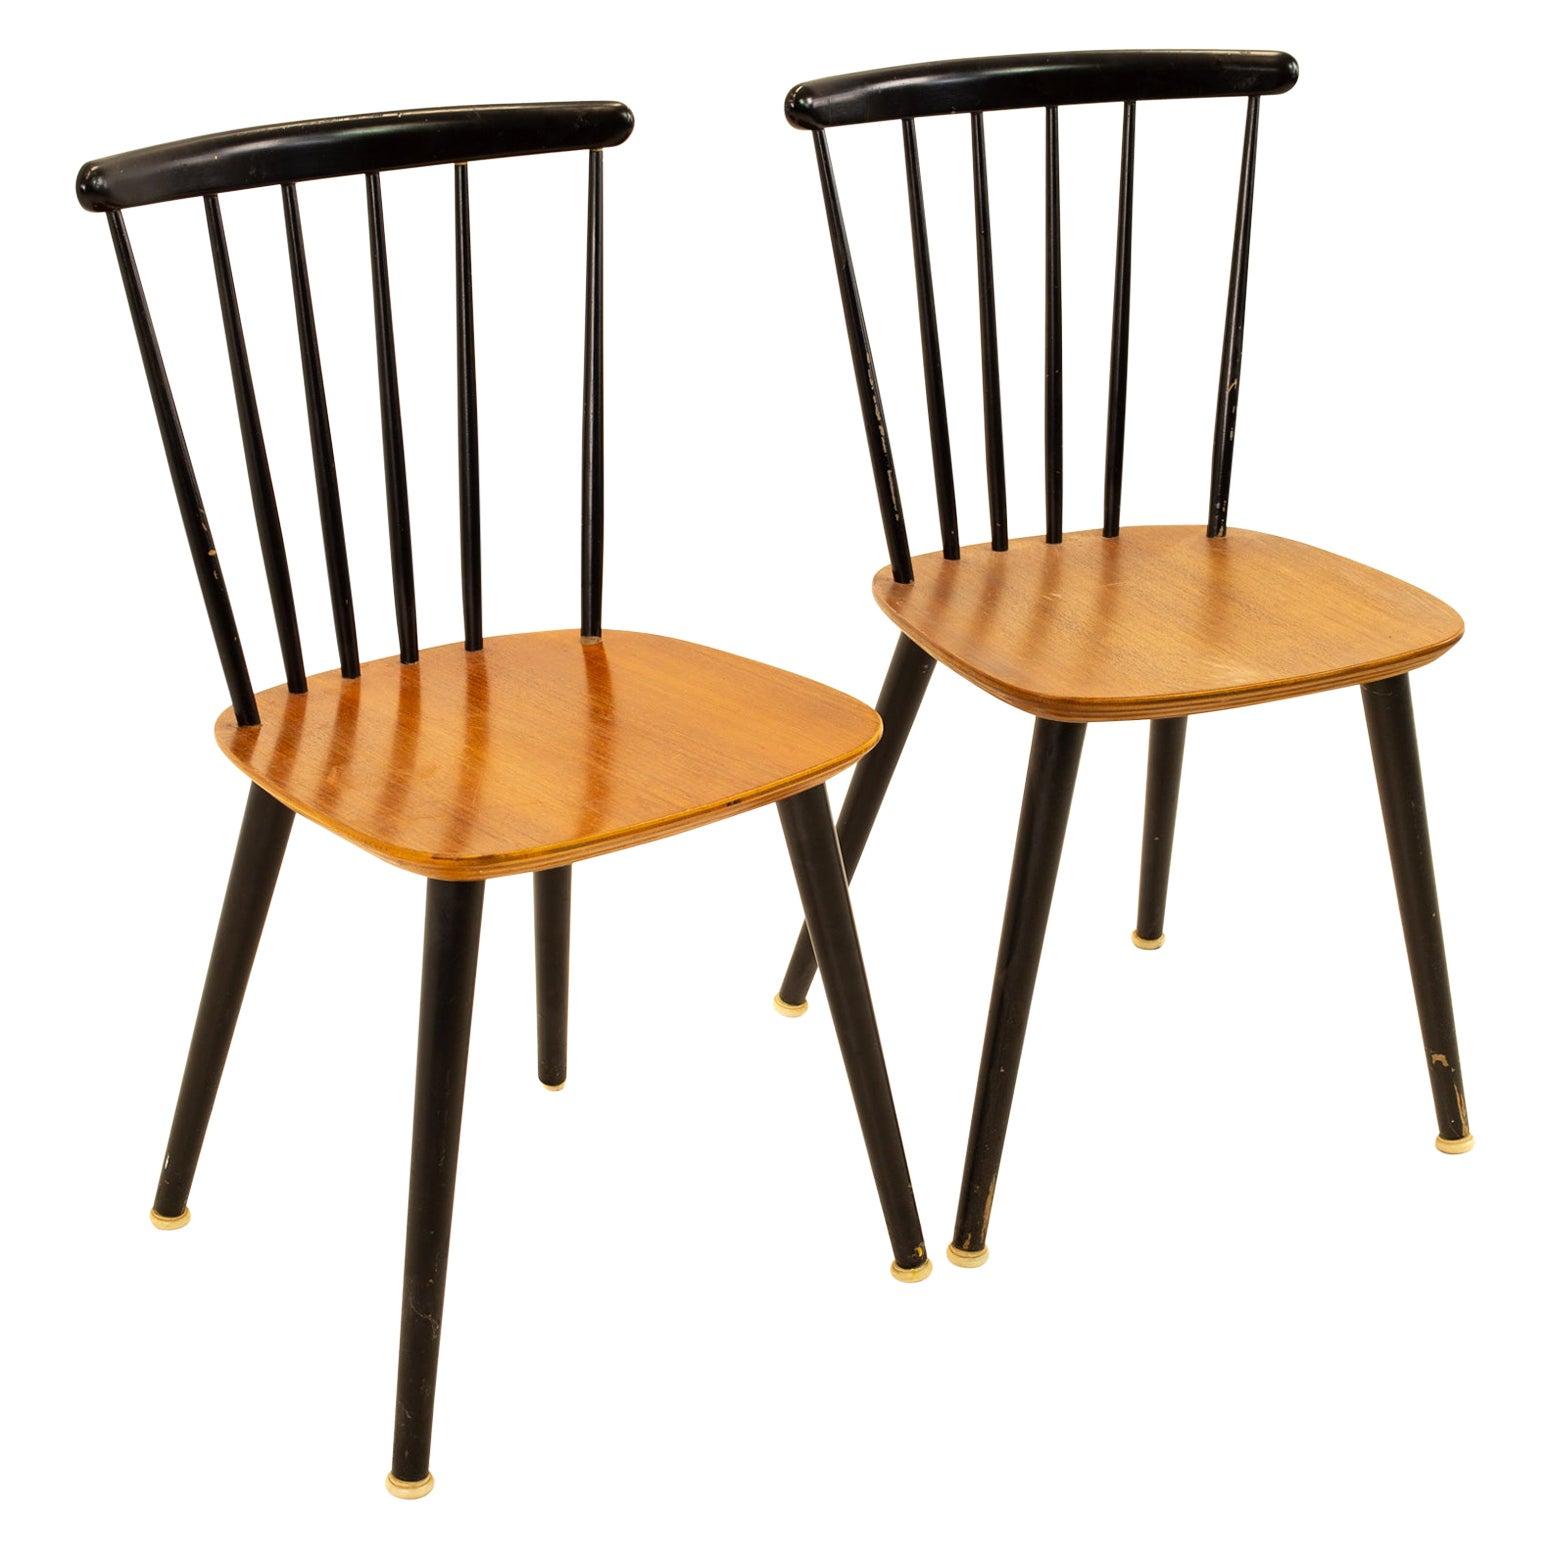 Pair of Thomas Harlev for Farstrup Mobelfabrik Danish Mid Century Dining Chairs